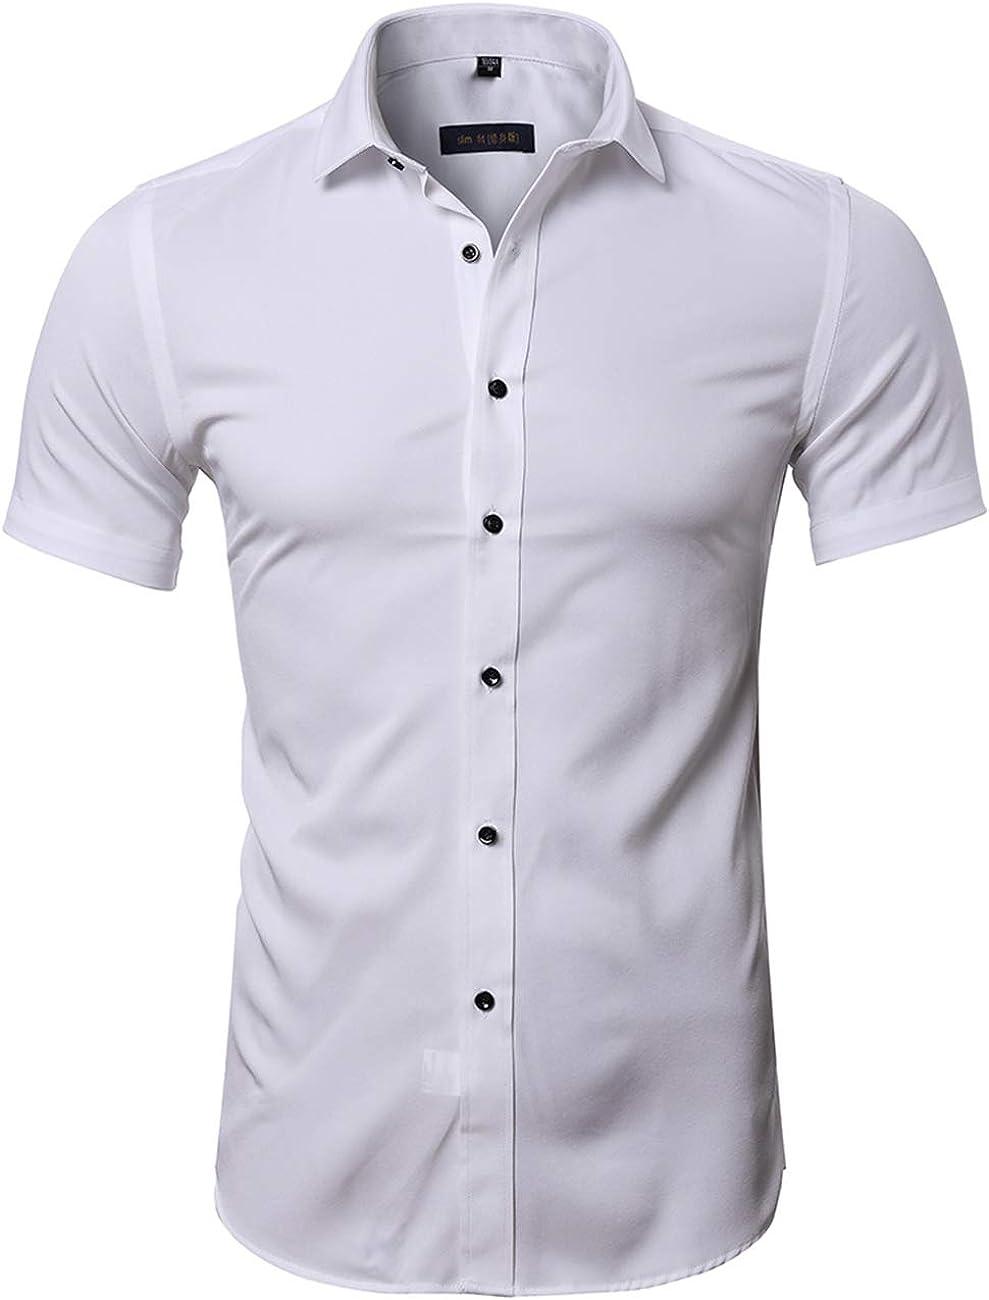 Camisa Bambú Fibra Hombre, Manga Corta, Slim Fit, Camiseta Elástica Casual/Formal para Hombre